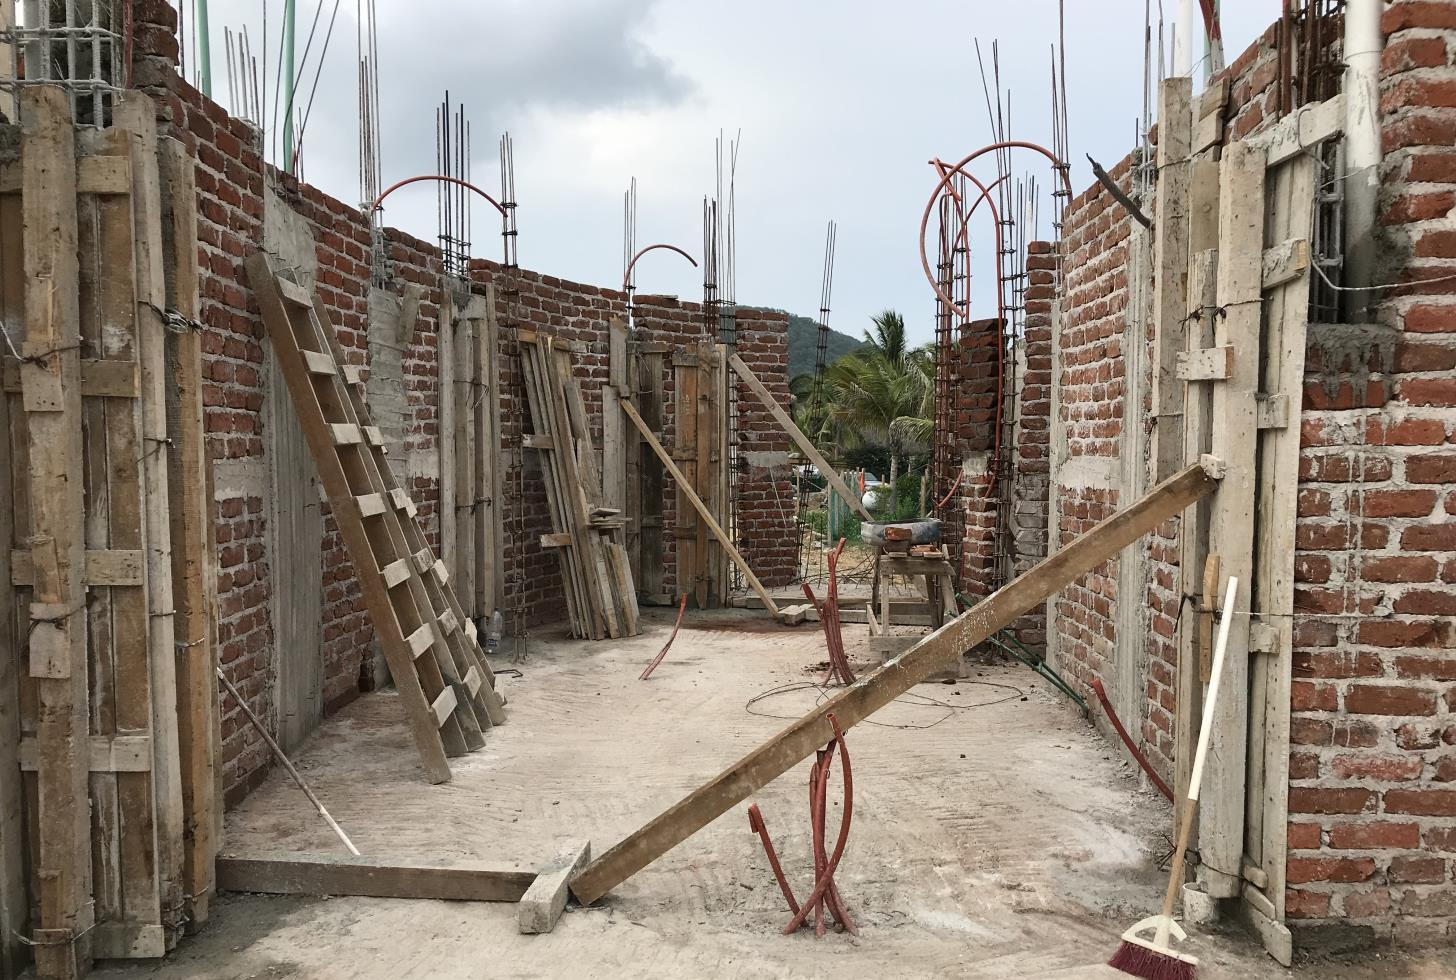 REPORTE-FOTOGRAFICO-PUNTA-MAJAHUA-18-DE-AGOSTO-DEL-2018-030.jpg